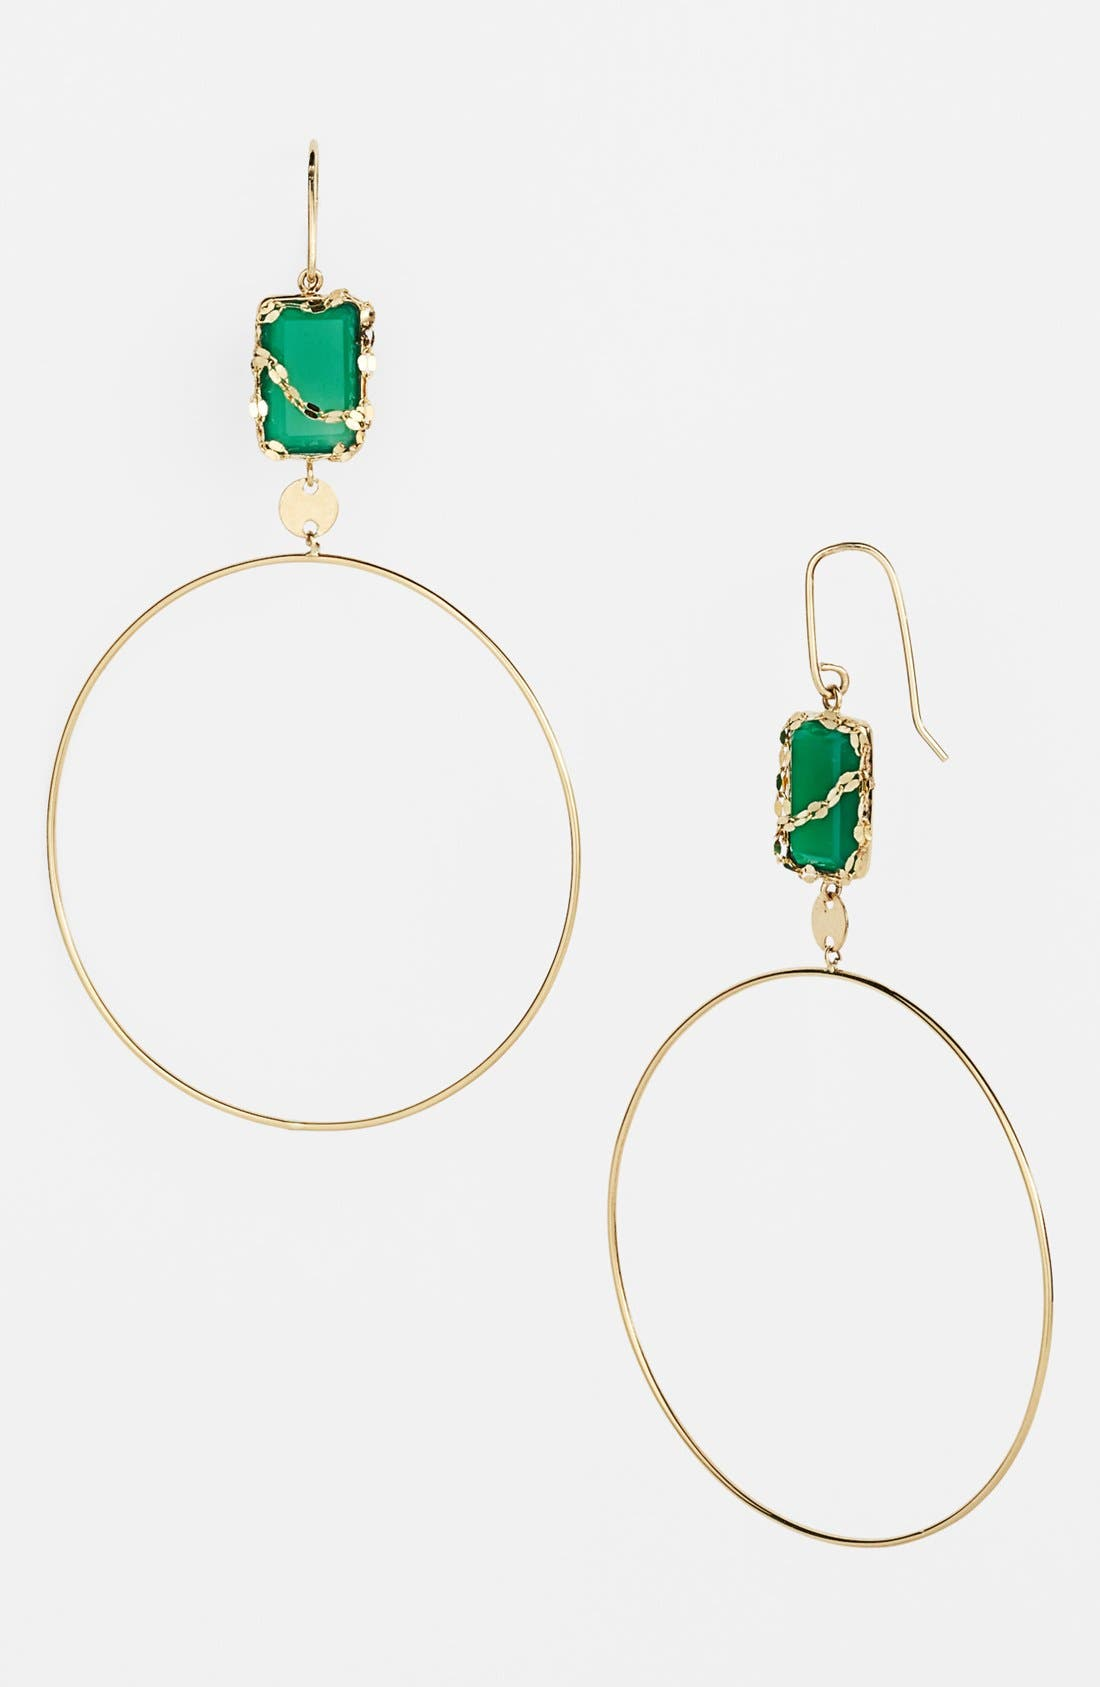 Alternate Image 1 Selected - Lana Jewelry 'Spellbound - Small Glow' Dangle Hoop Earrings (Nordstrom Exclusive)